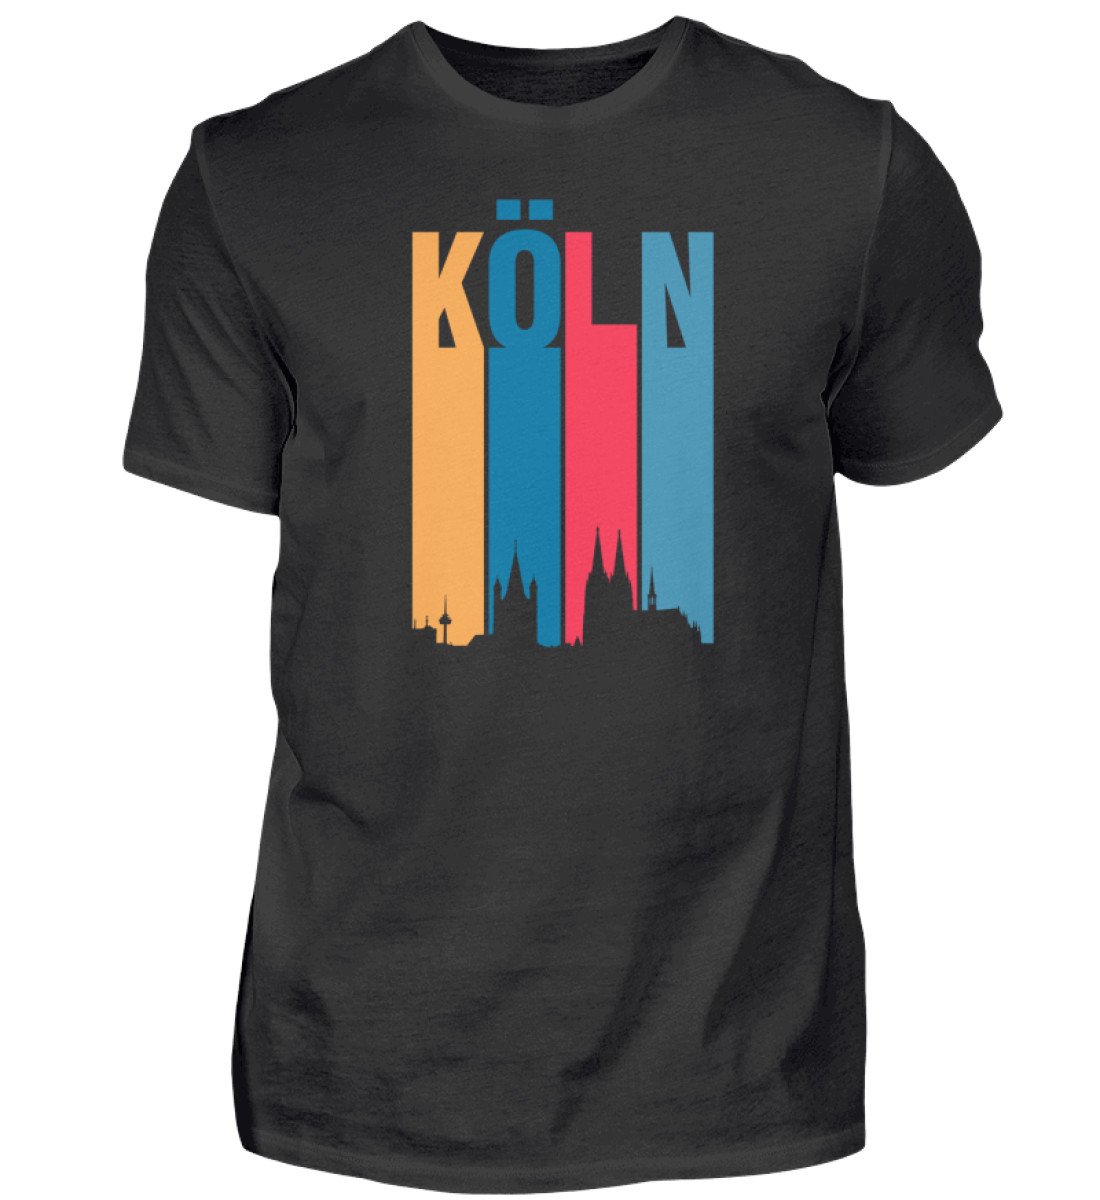 Köln ist bunt - Herren Shirt-16